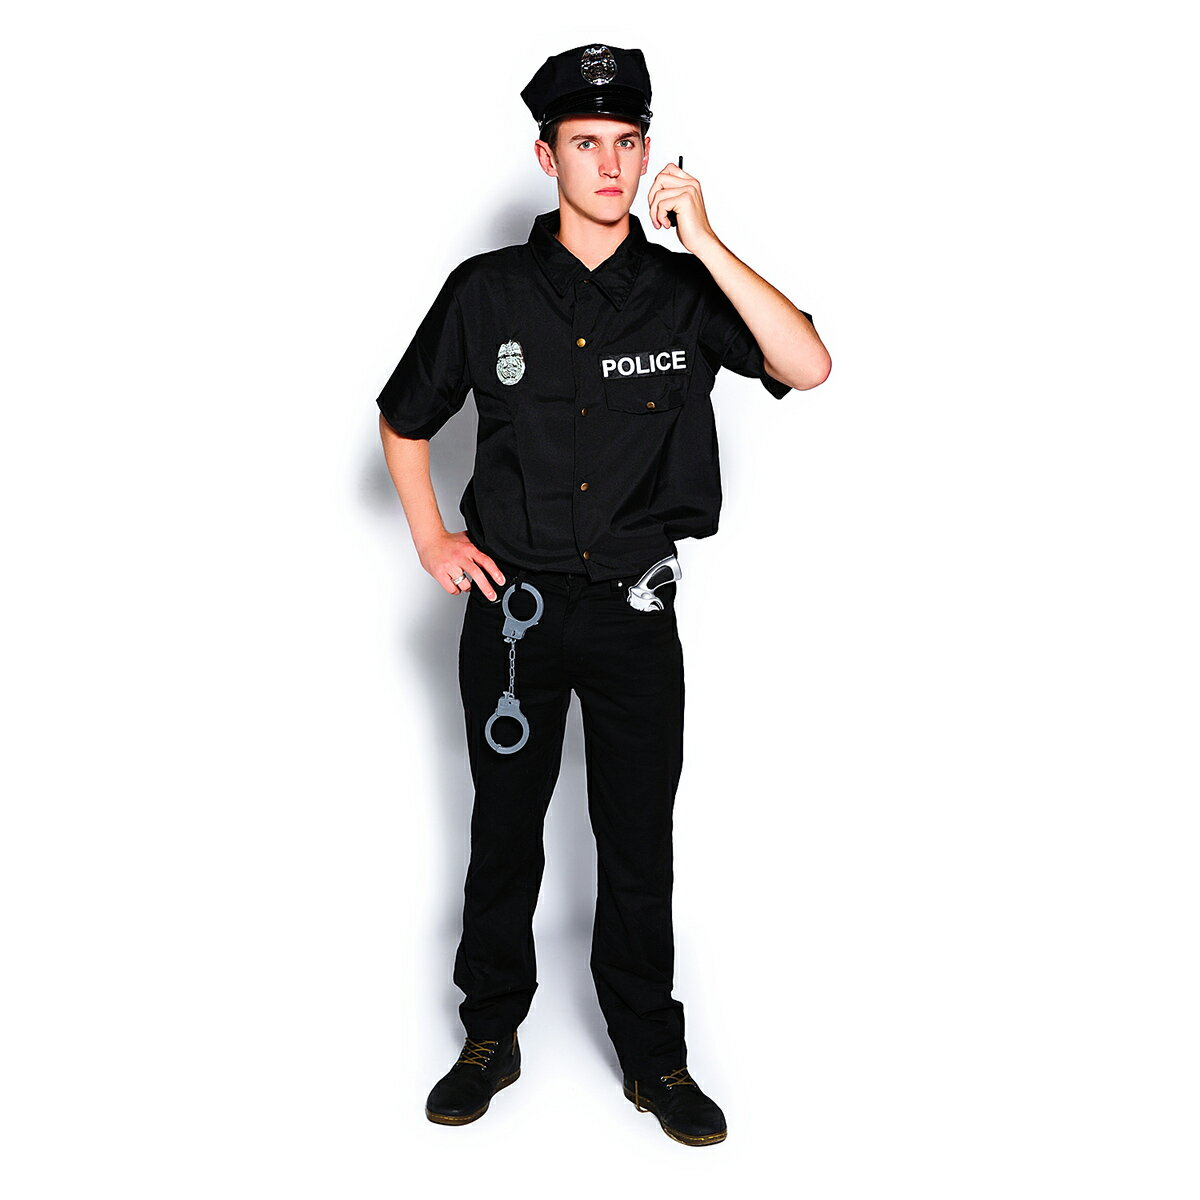 Veroman メンズ ポリス 警官 コスプレ ハロウィン 衣装 仮装 4点セット